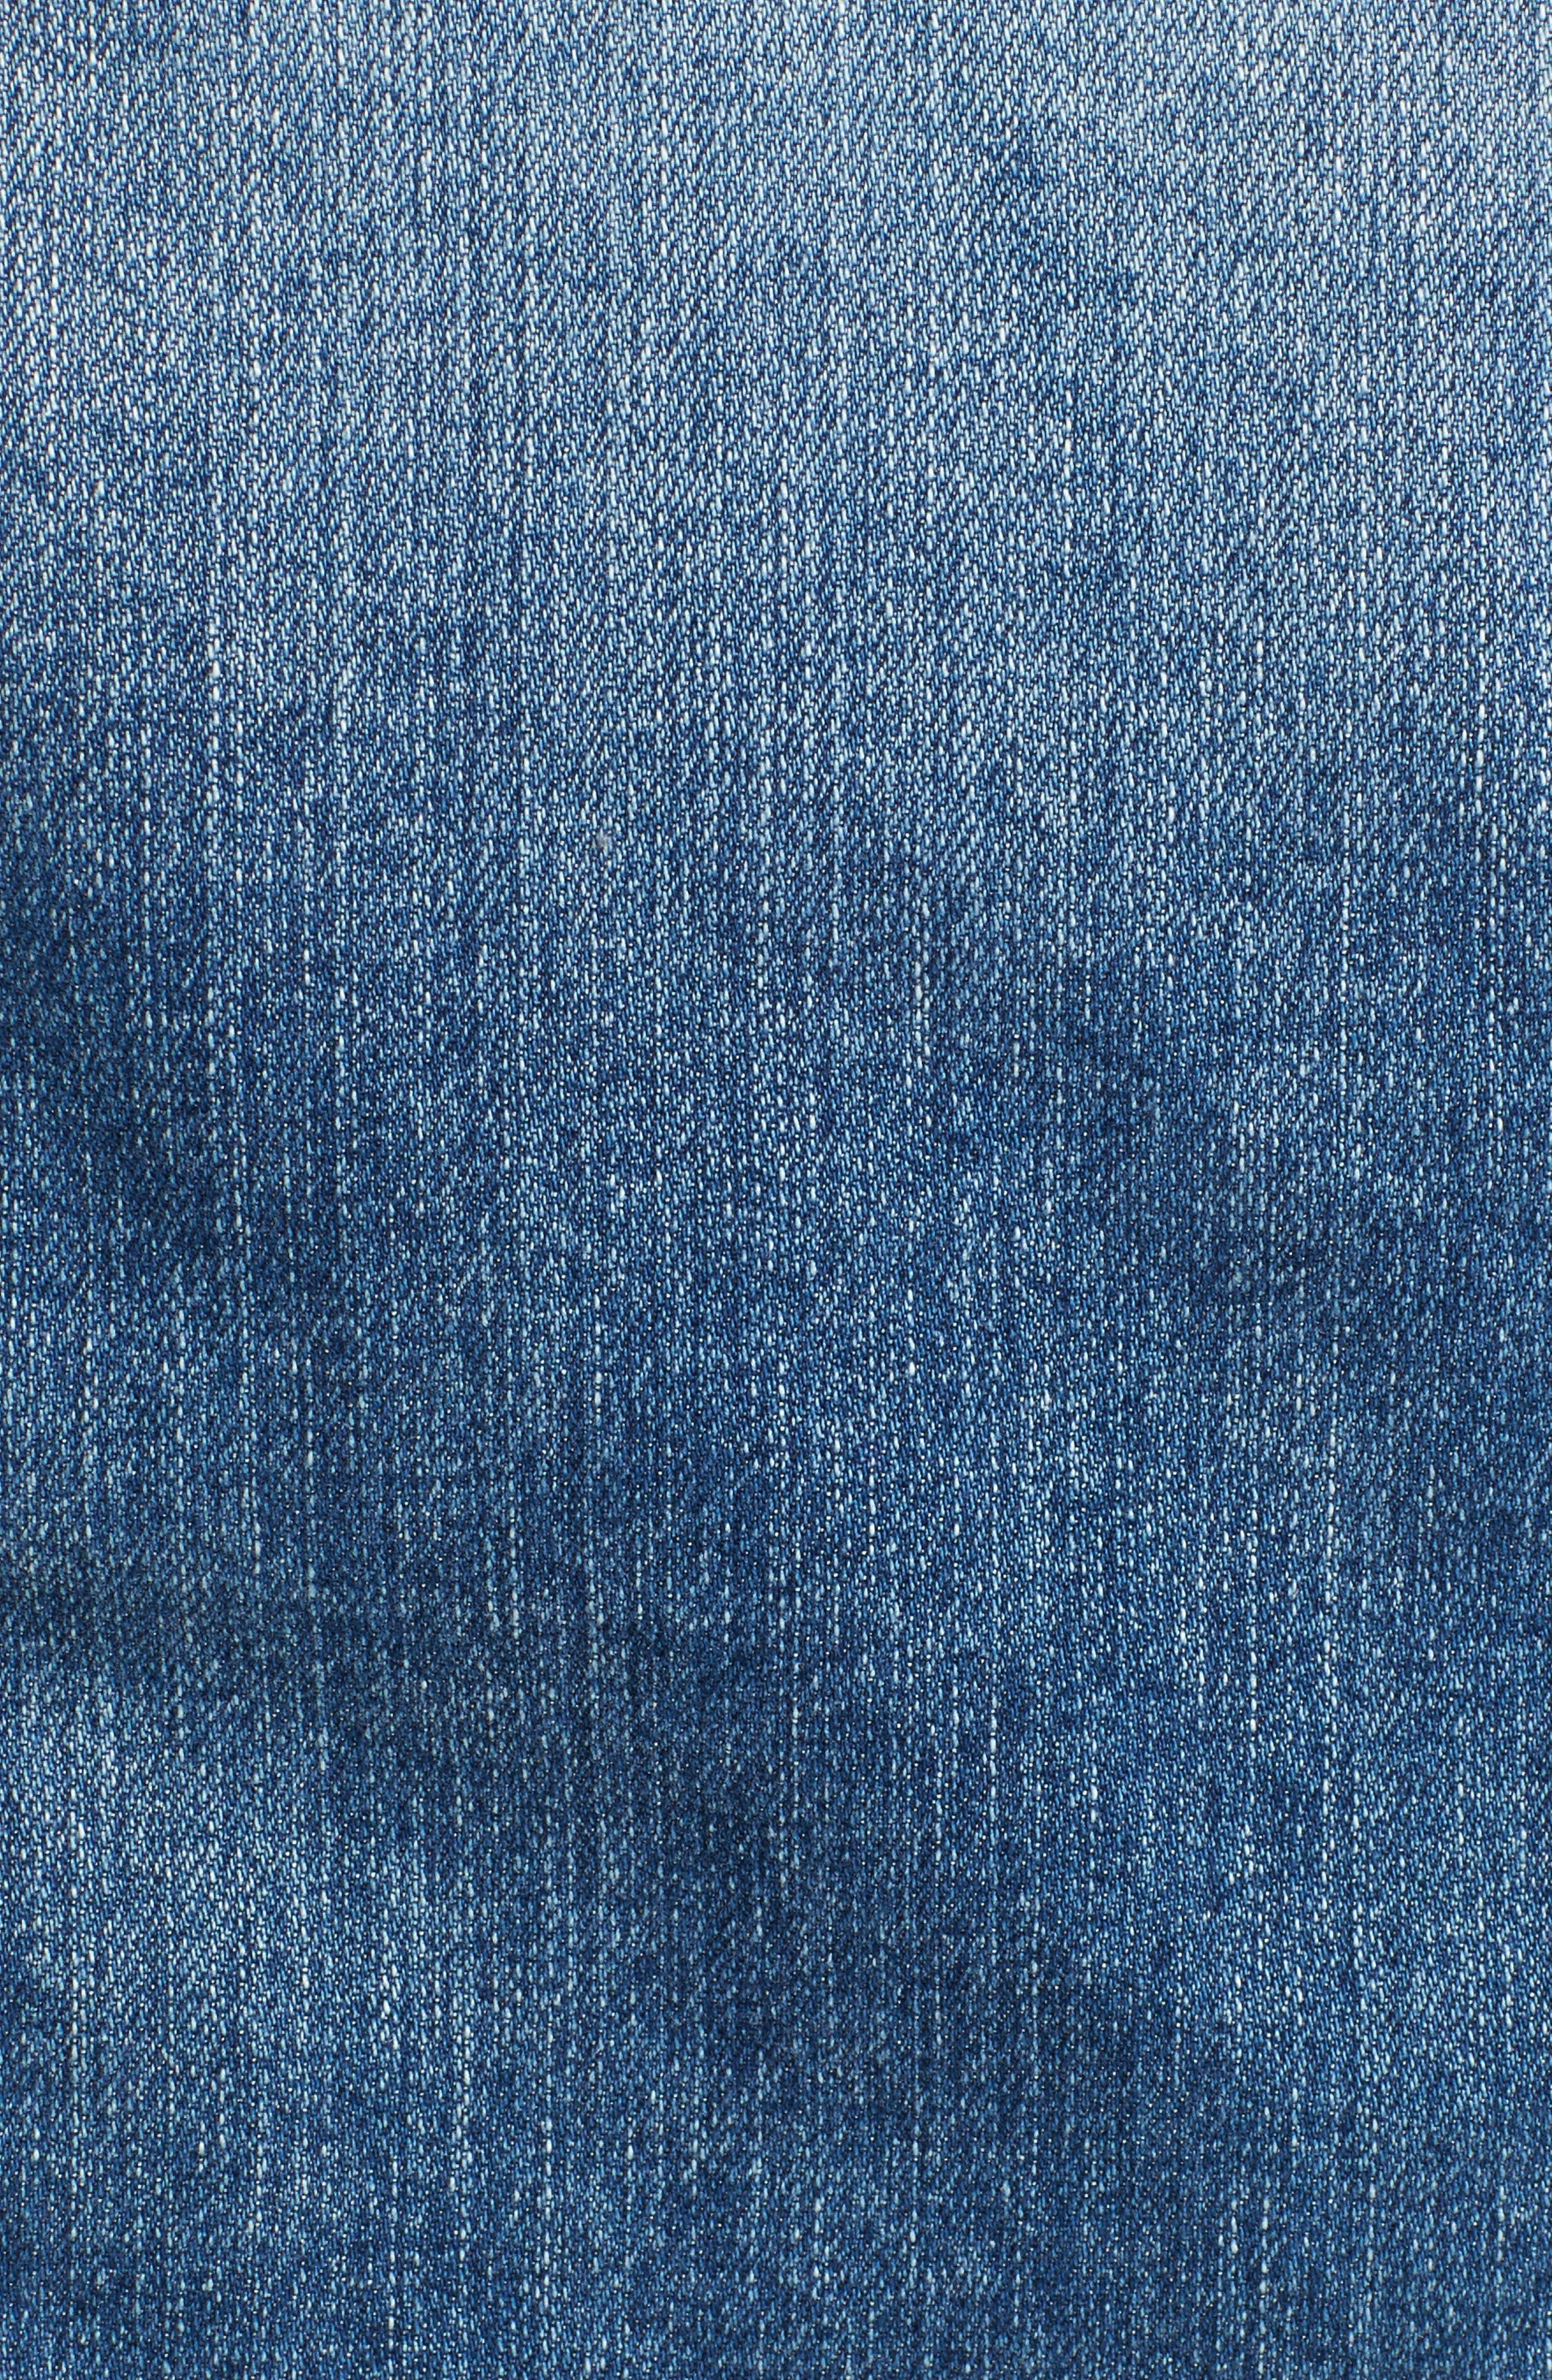 'Mya' Denim Jacket,                             Alternate thumbnail 6, color,                             10 Years Magnetic Blue